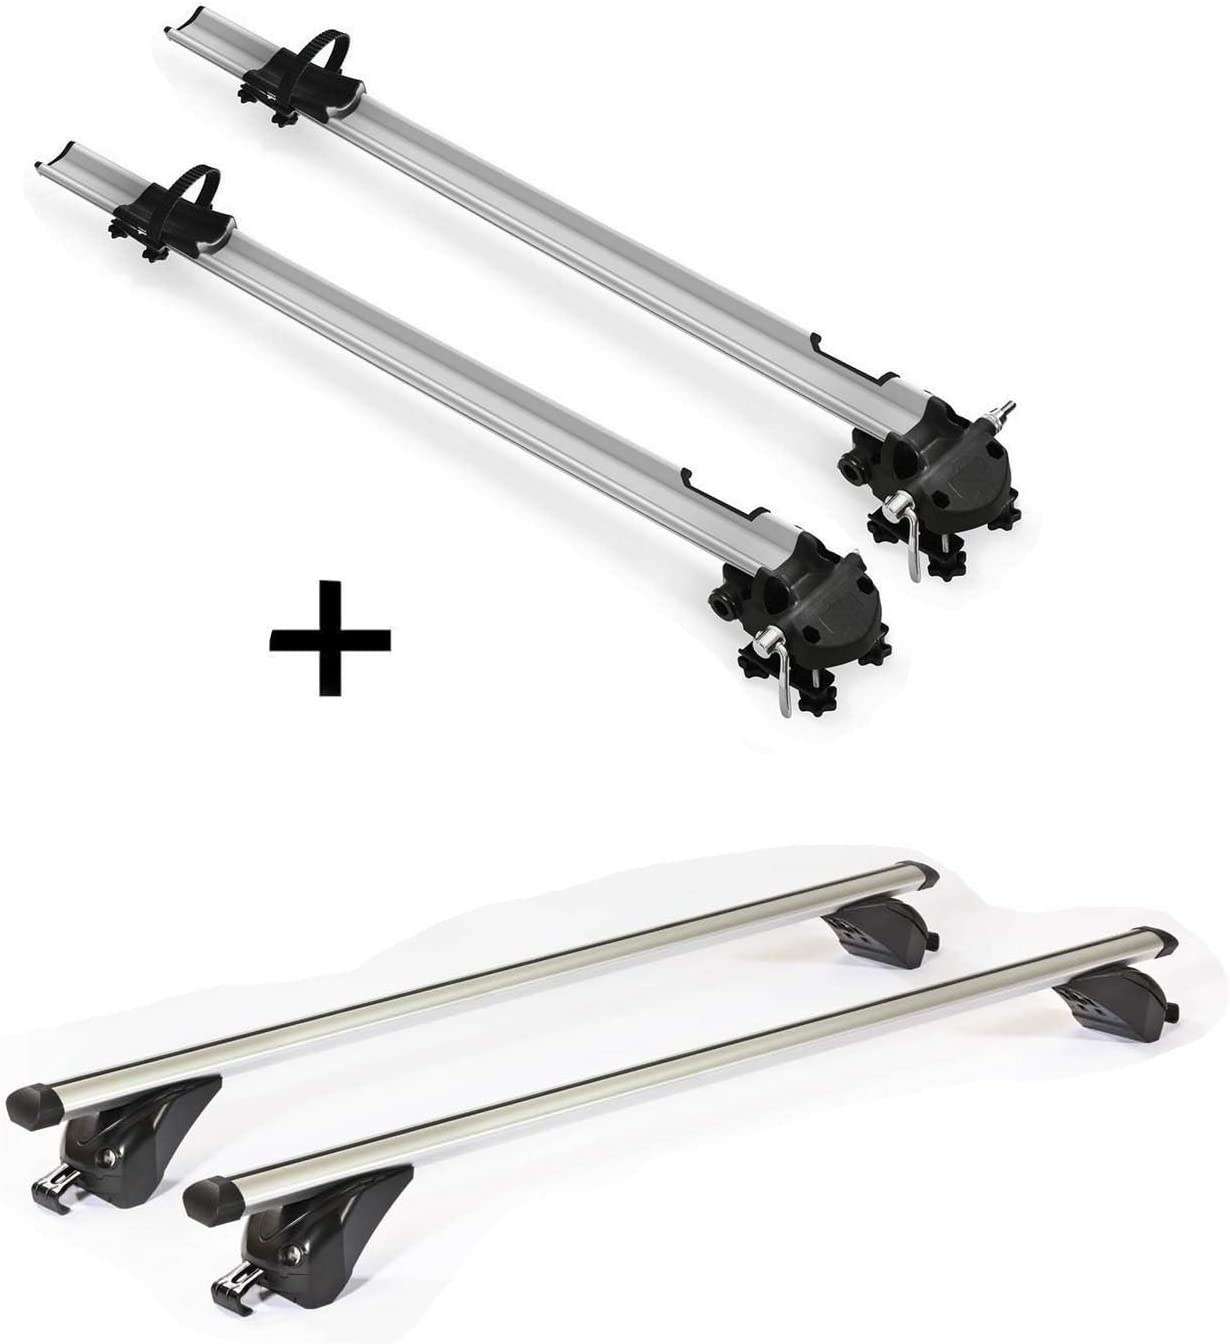 Barres de Toit VDPKING1 Compatible avec BMW X3 F25 5 Portes Lot de 2 Porte-v/élos Bike Pro 11-17